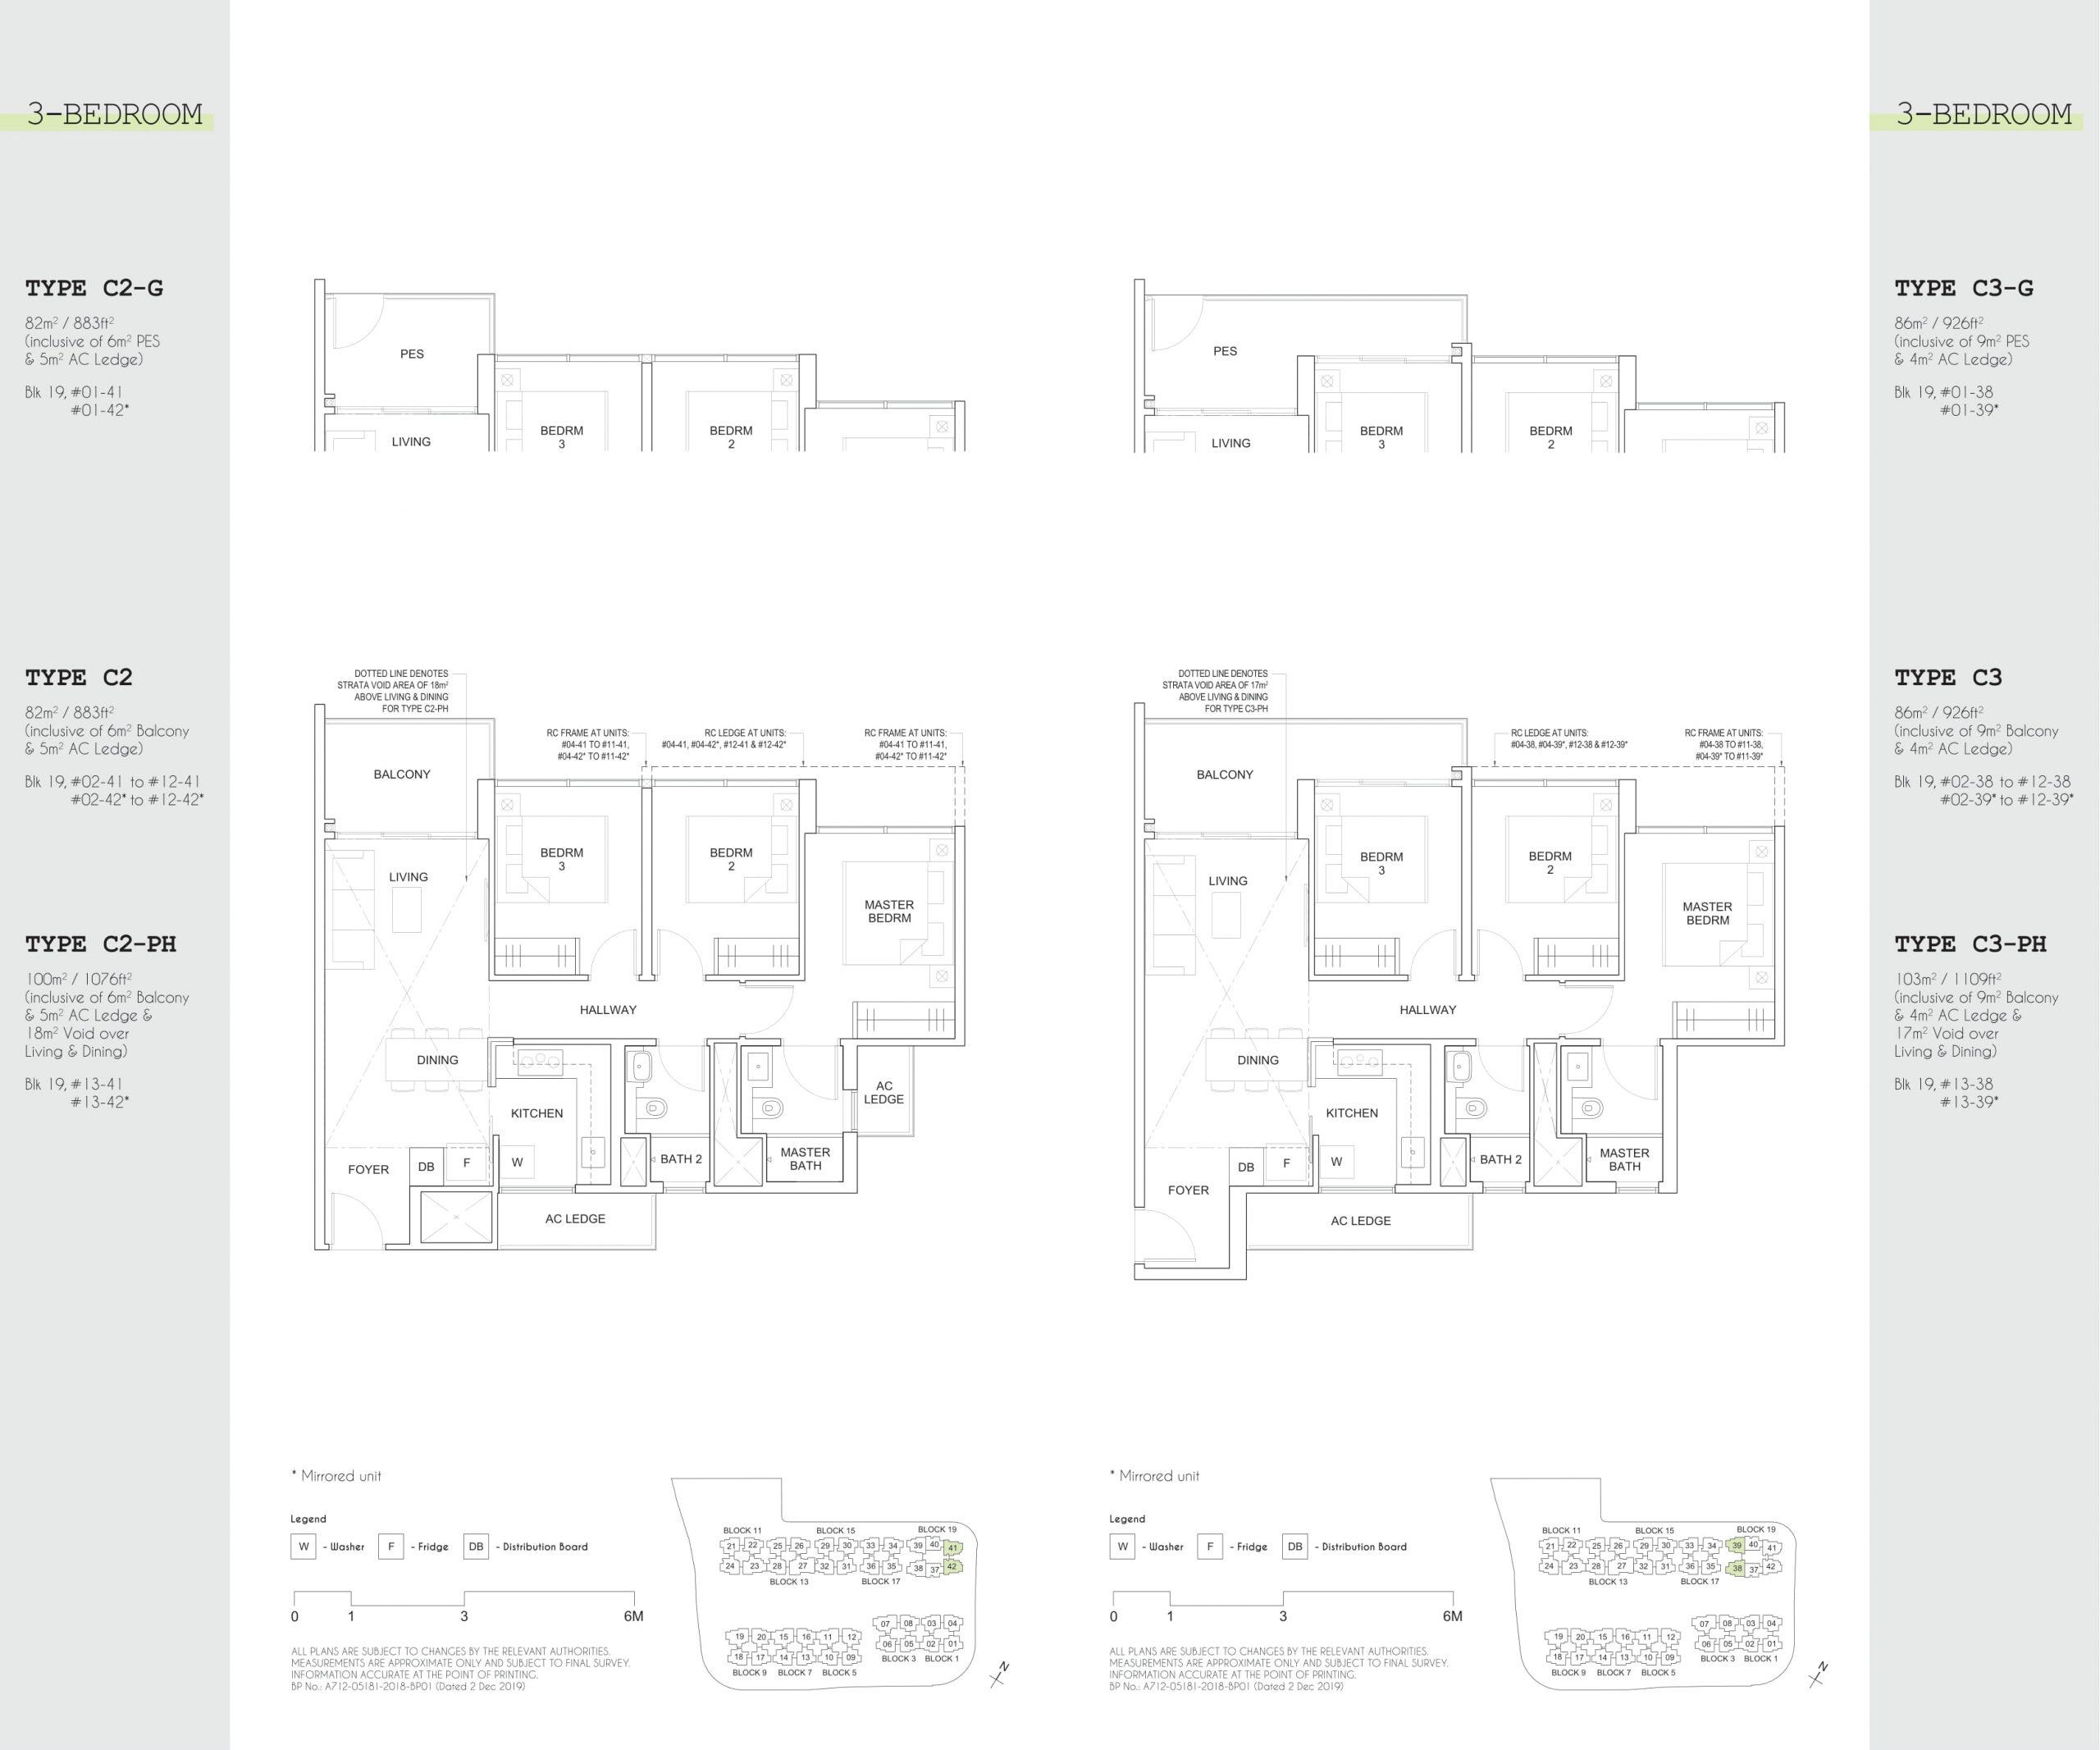 Parc Canberra EC's three-bedroom types